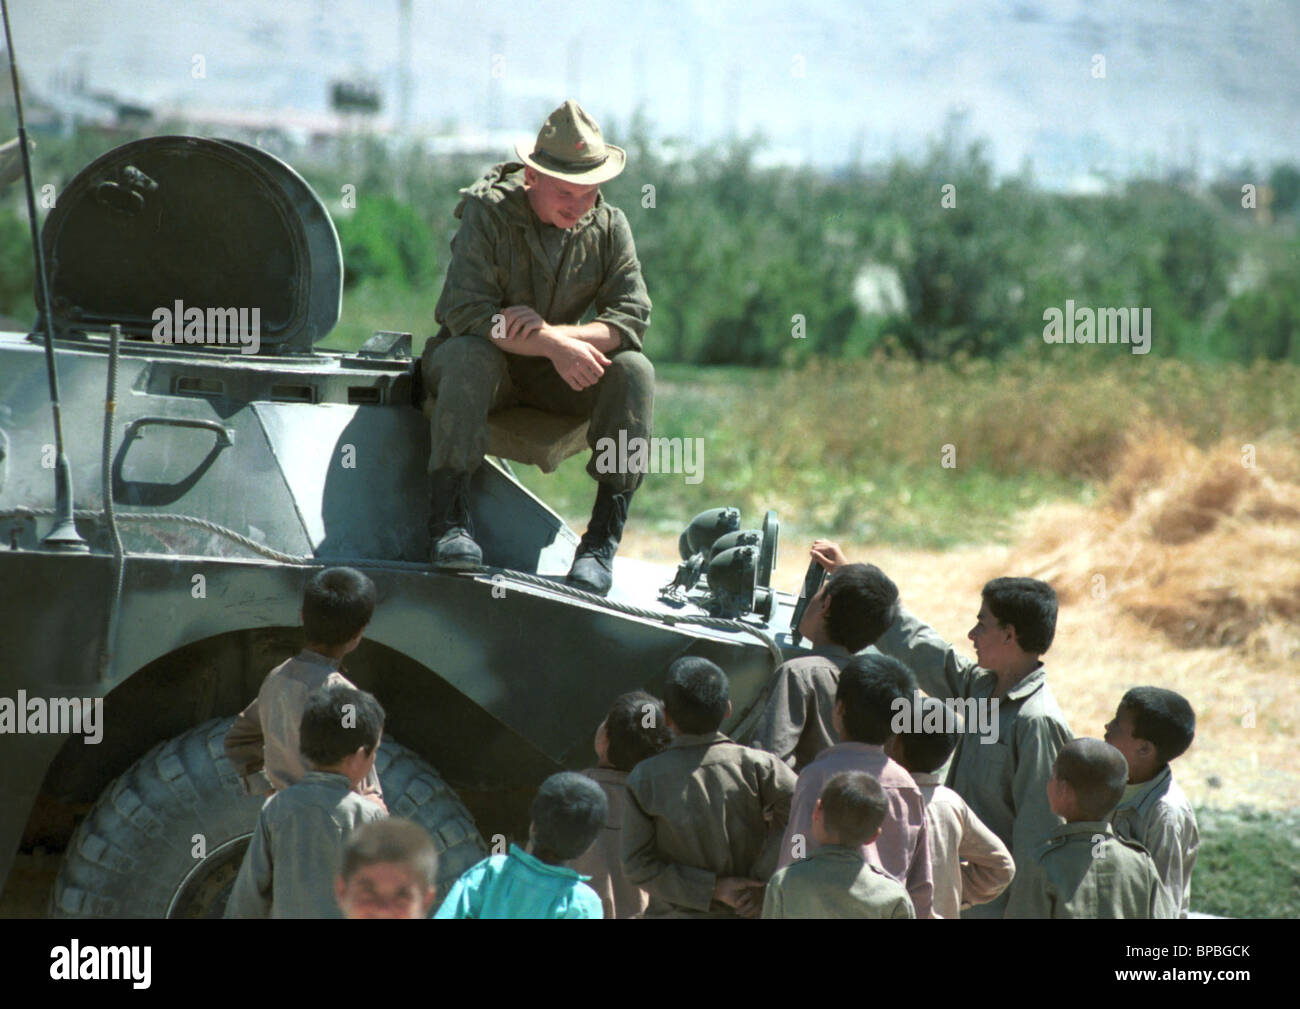 Soviet Afghanistan war - Page 6 Withdrawal-of-soviet-troops-from-afghanistan-1988-BPBGCK